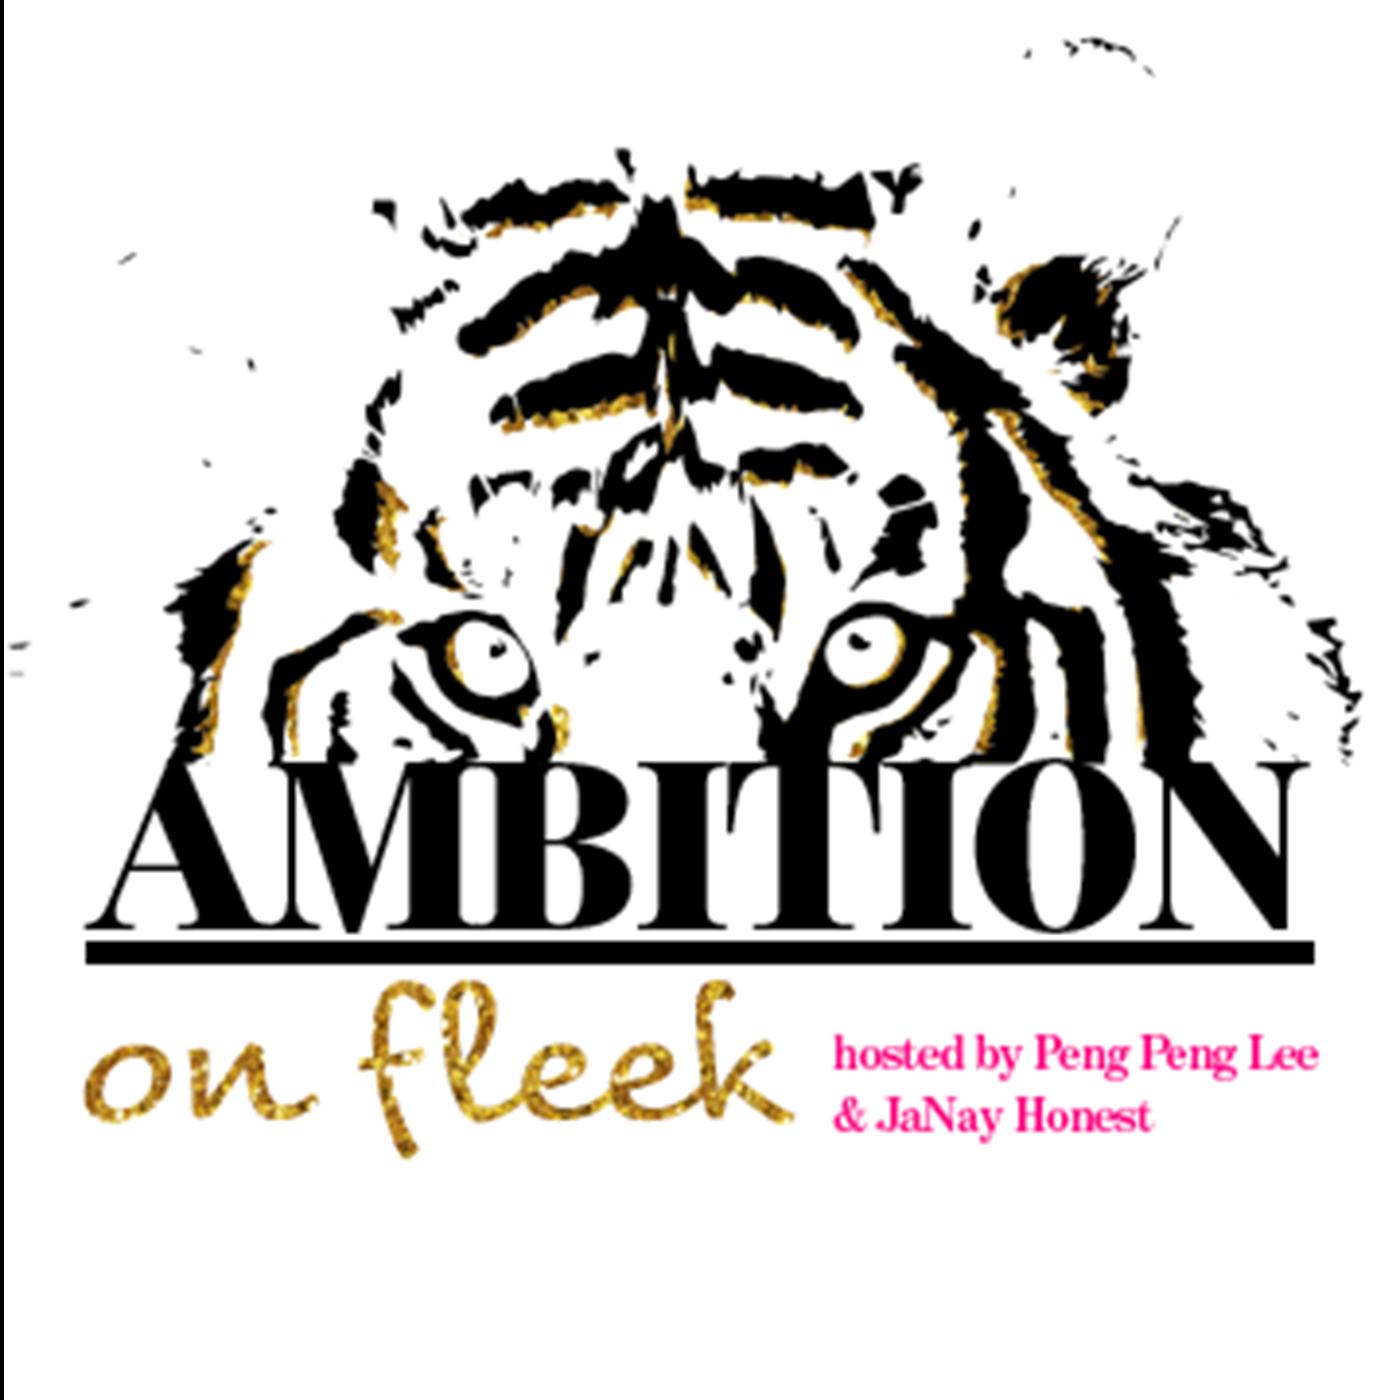 Ambition On Fleek with Peng Peng Lee & JaNay Honest